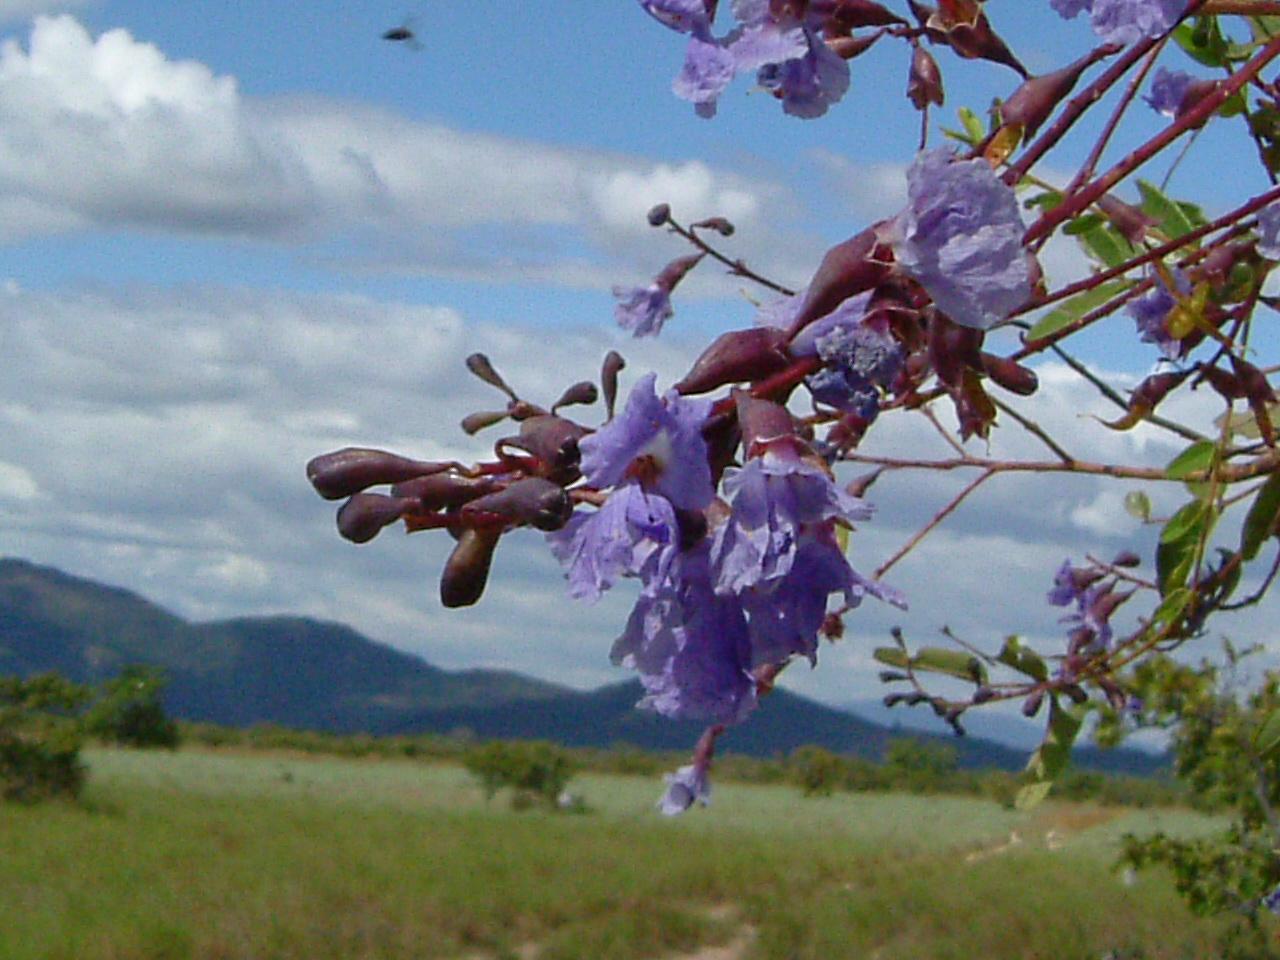 Specimen: Bowdichia virgilioides